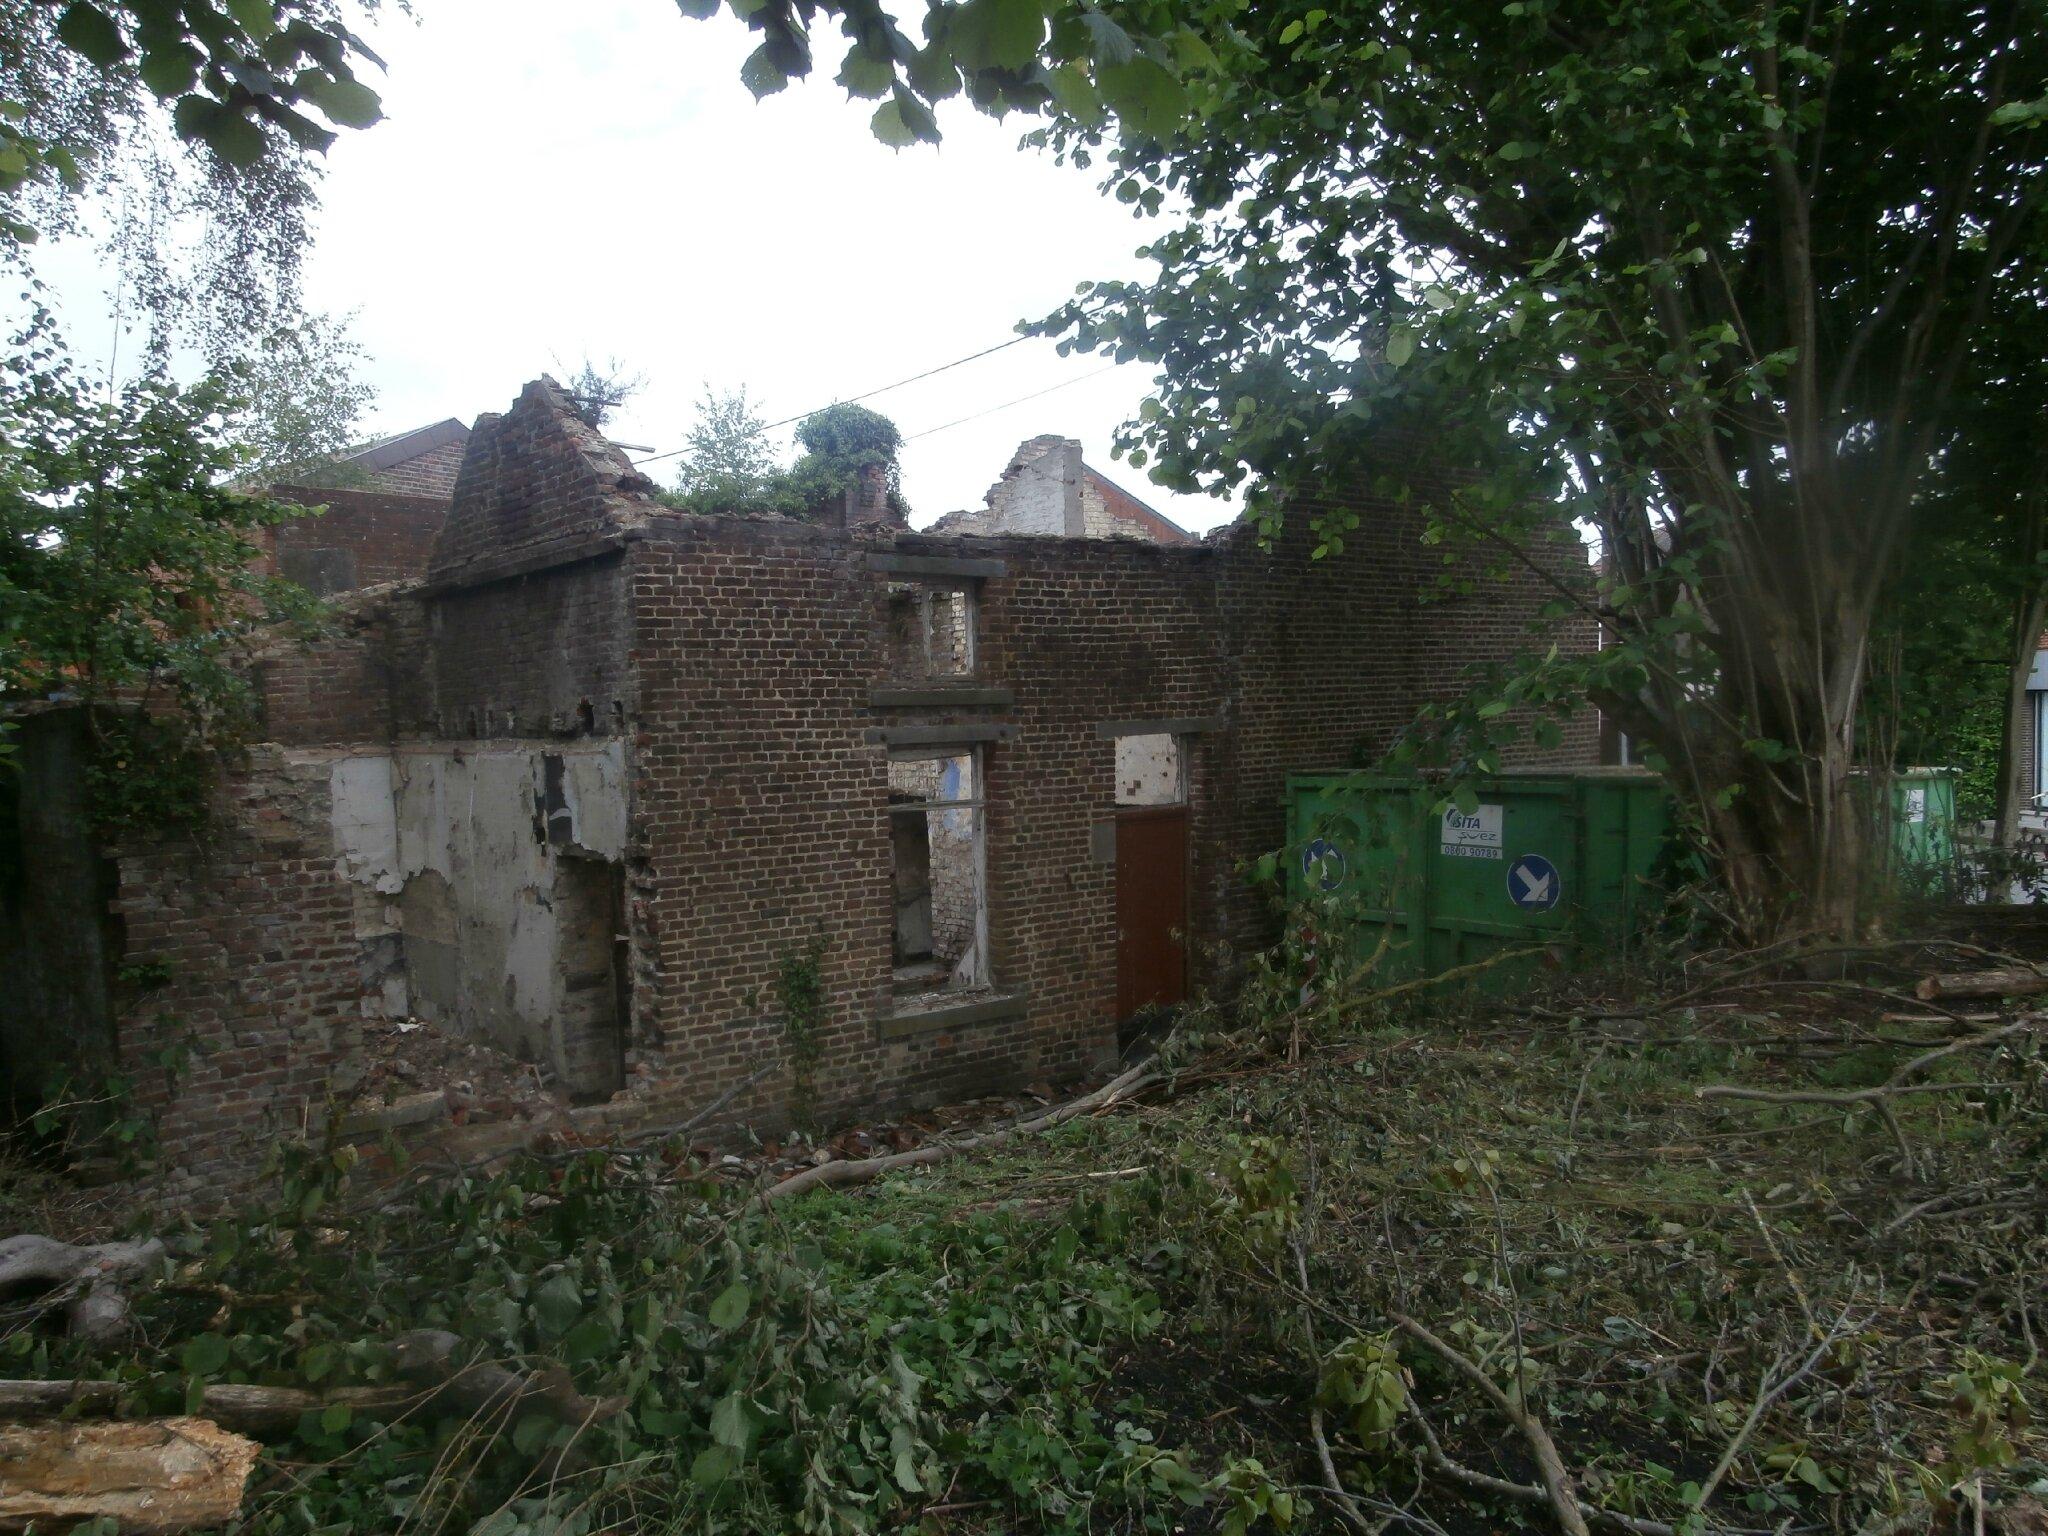 Maison Denis - 2014-05-28 - P5286100